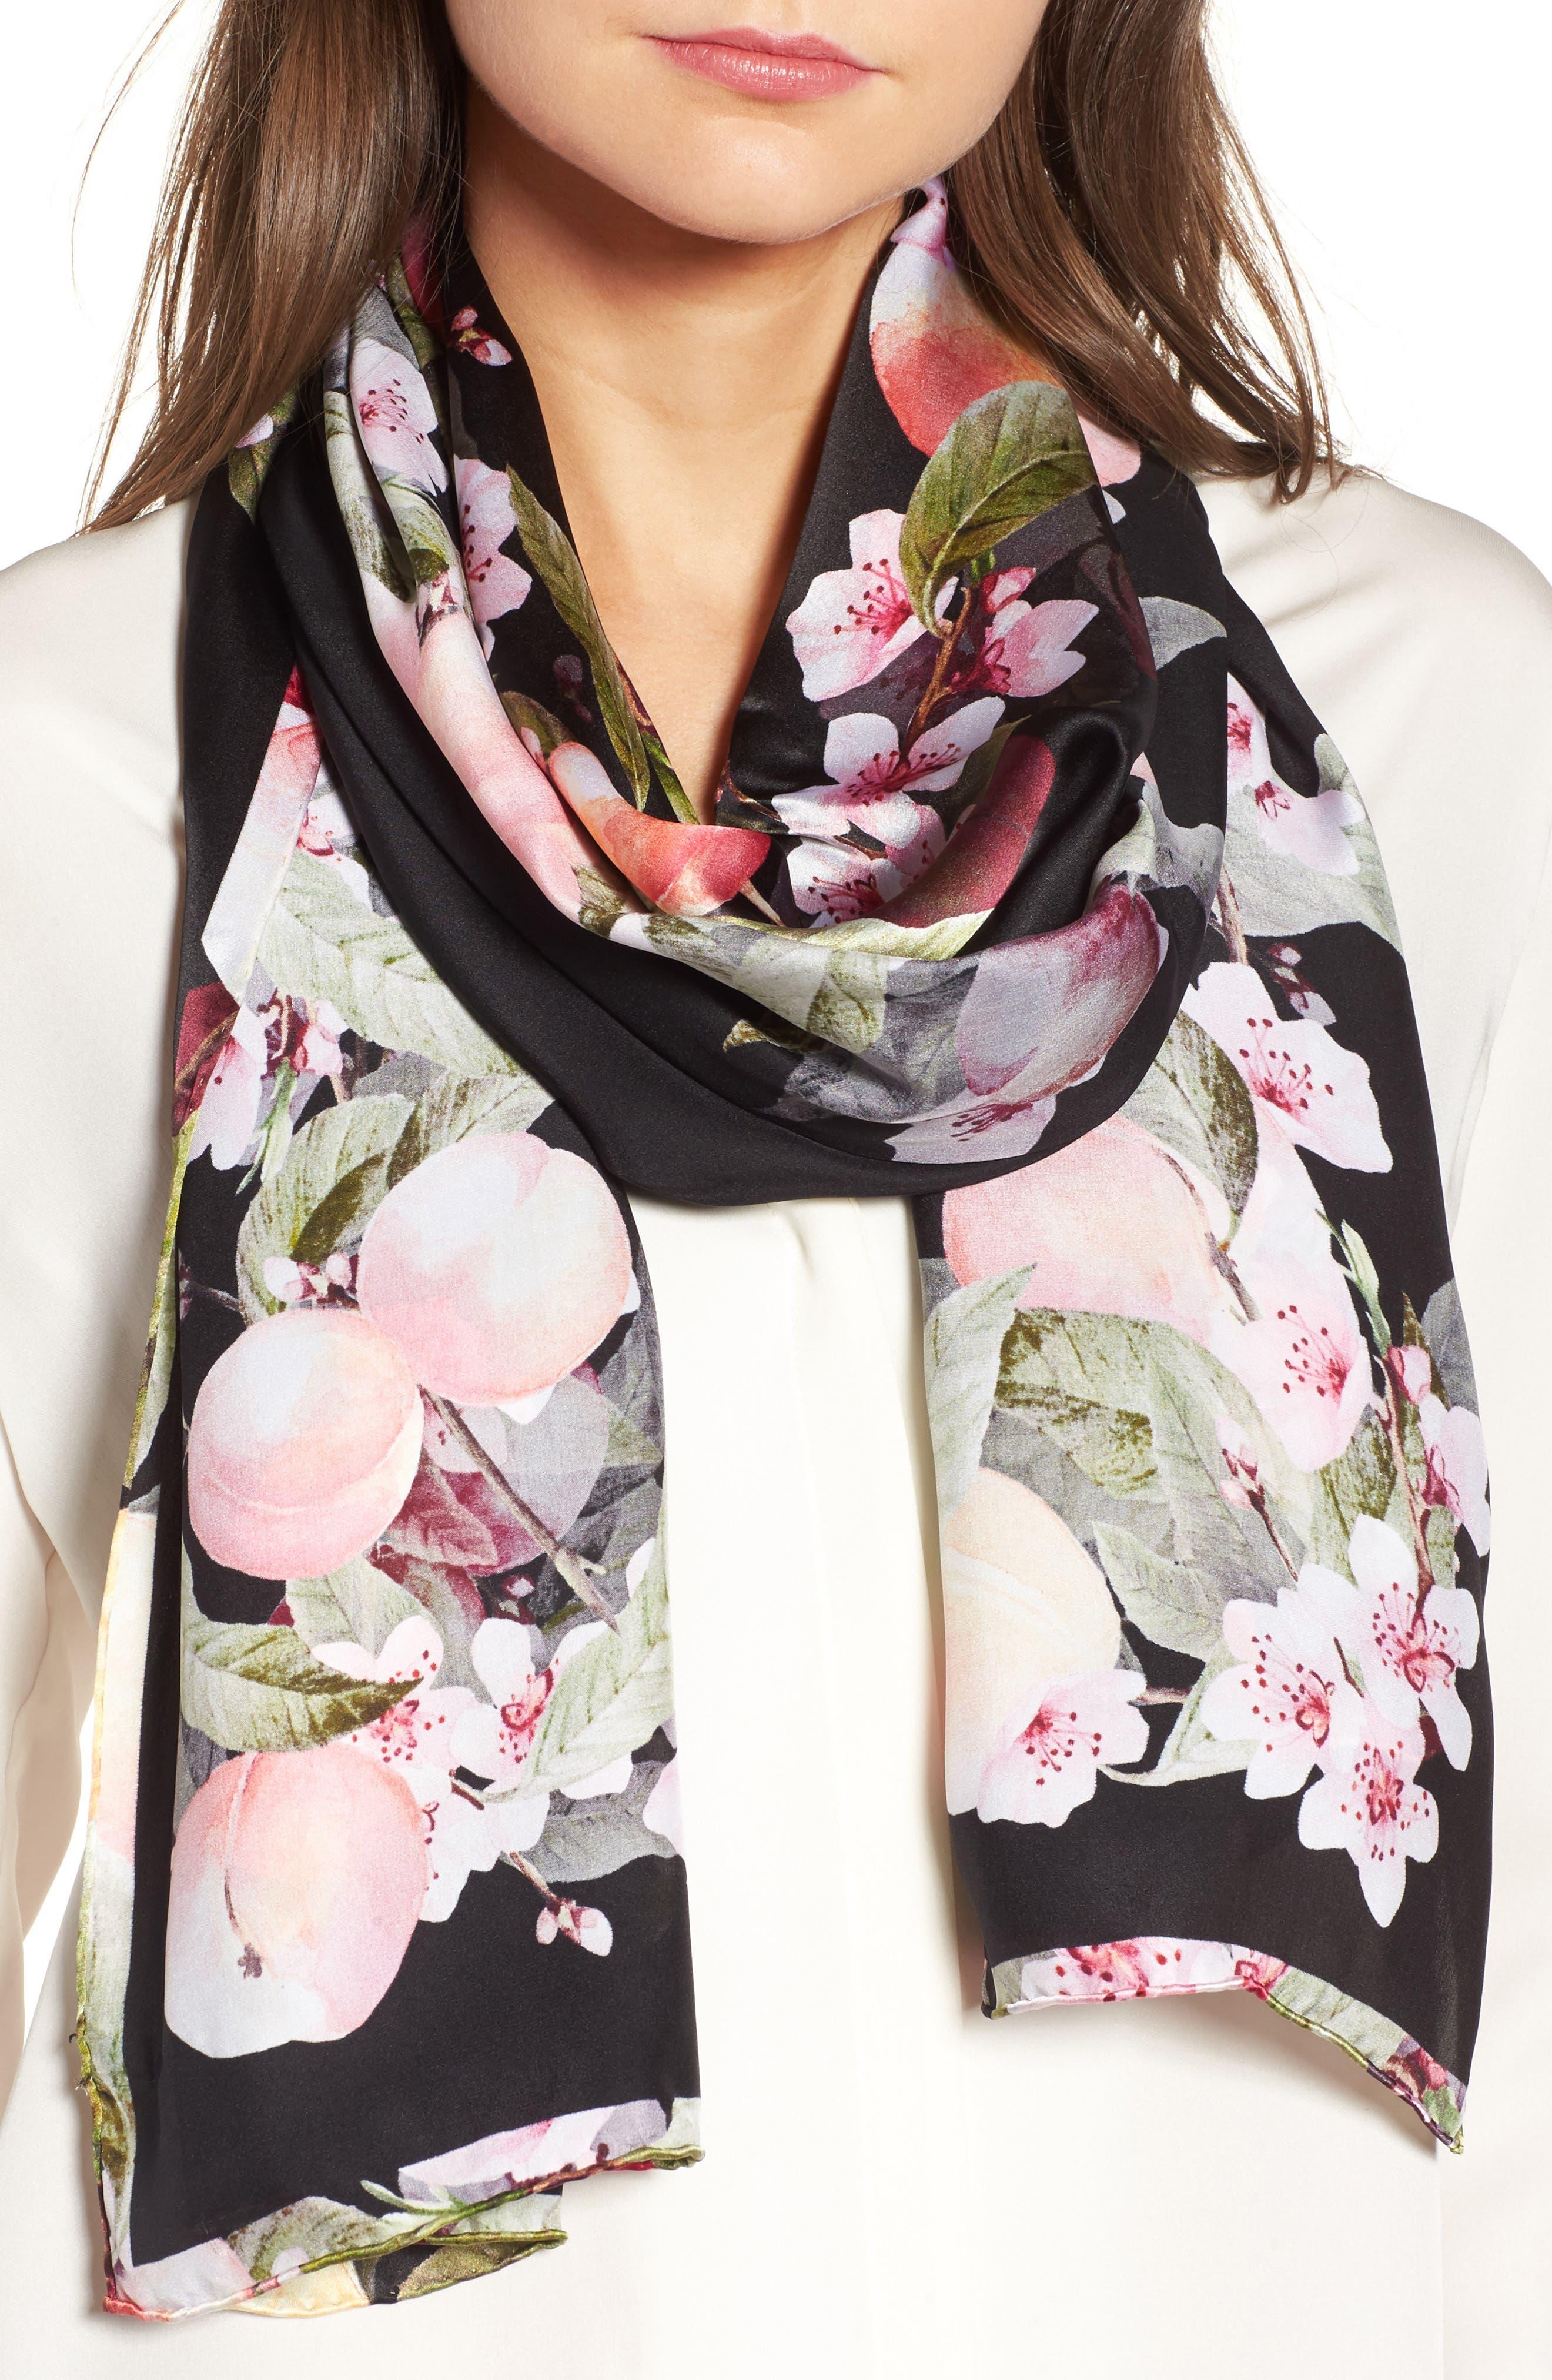 Peach Blossom Silk Scarf,                         Main,                         color, 00-Black